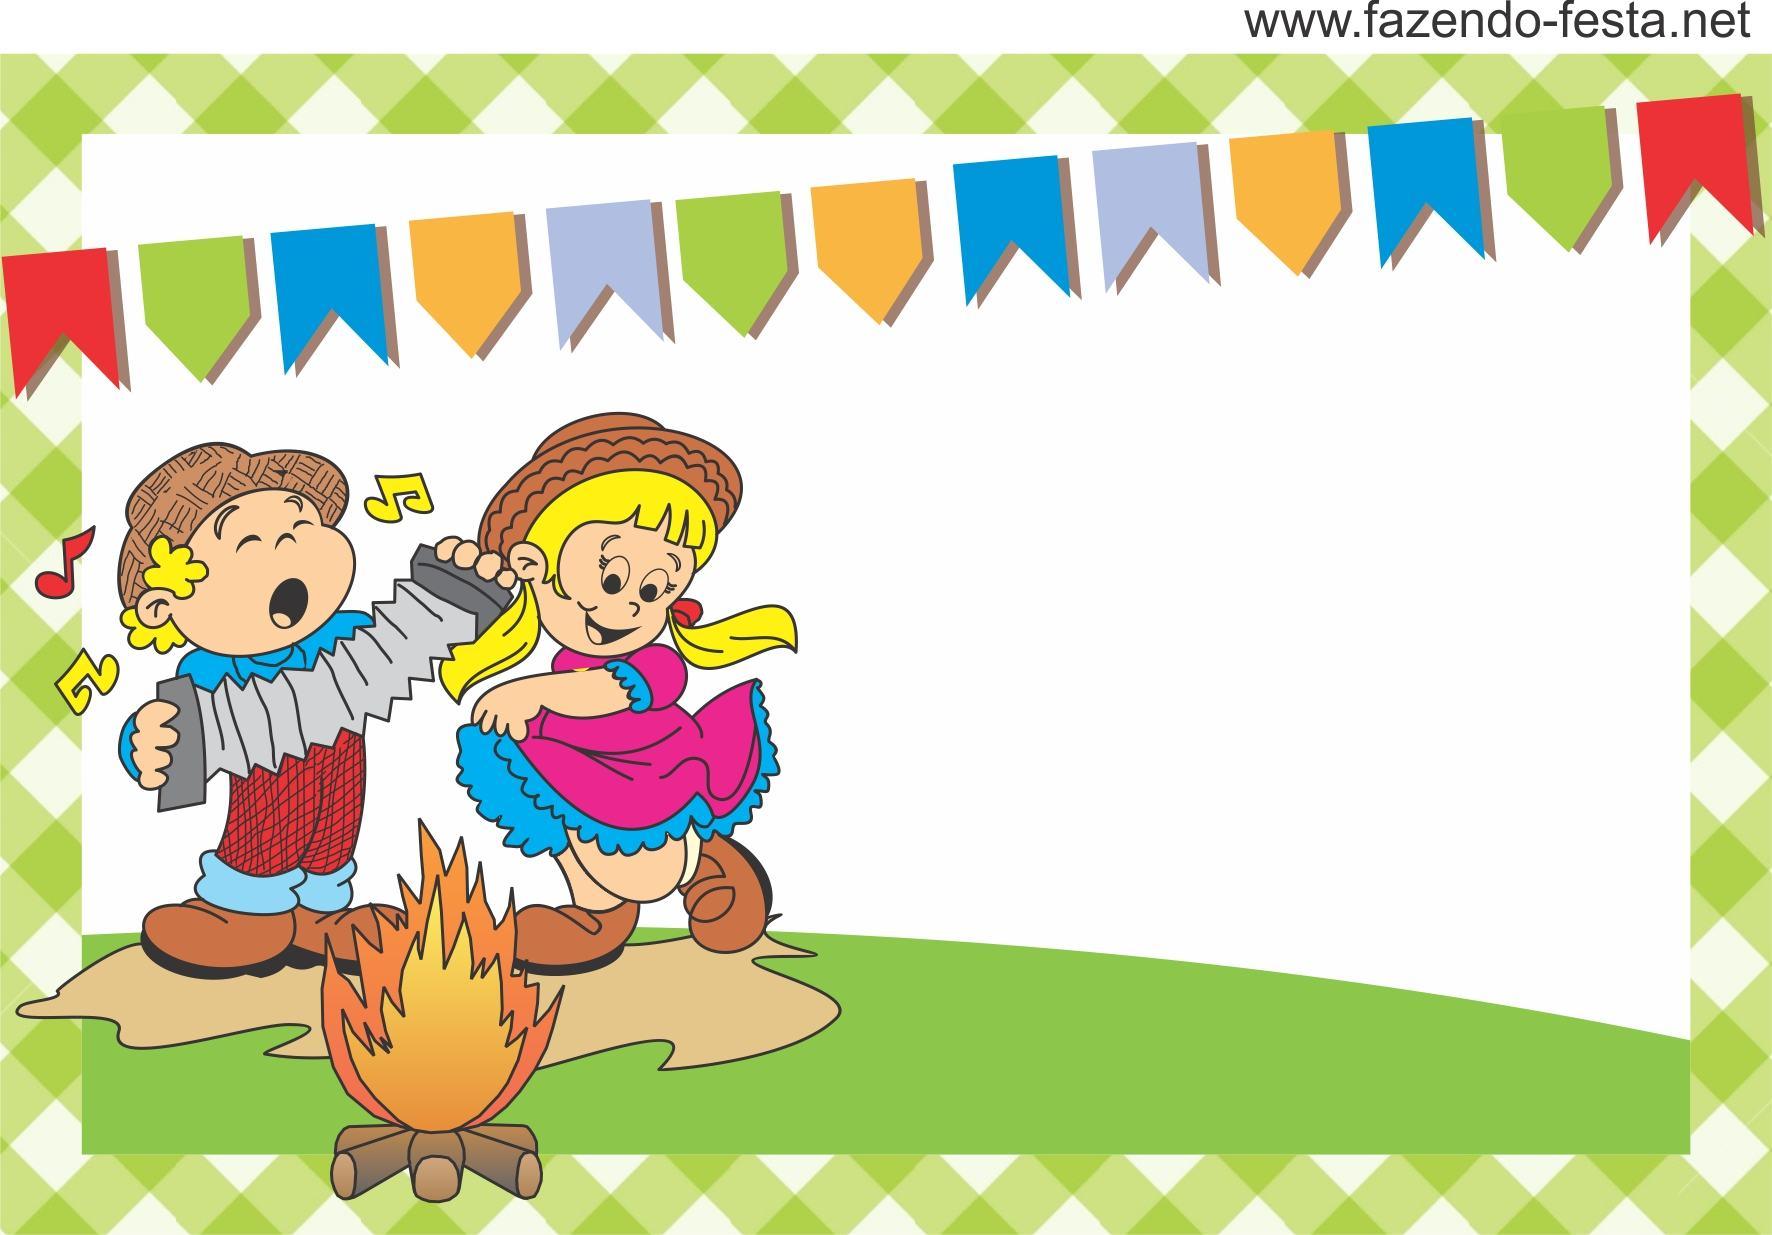 Convite Festa Junina para imprimir grátis